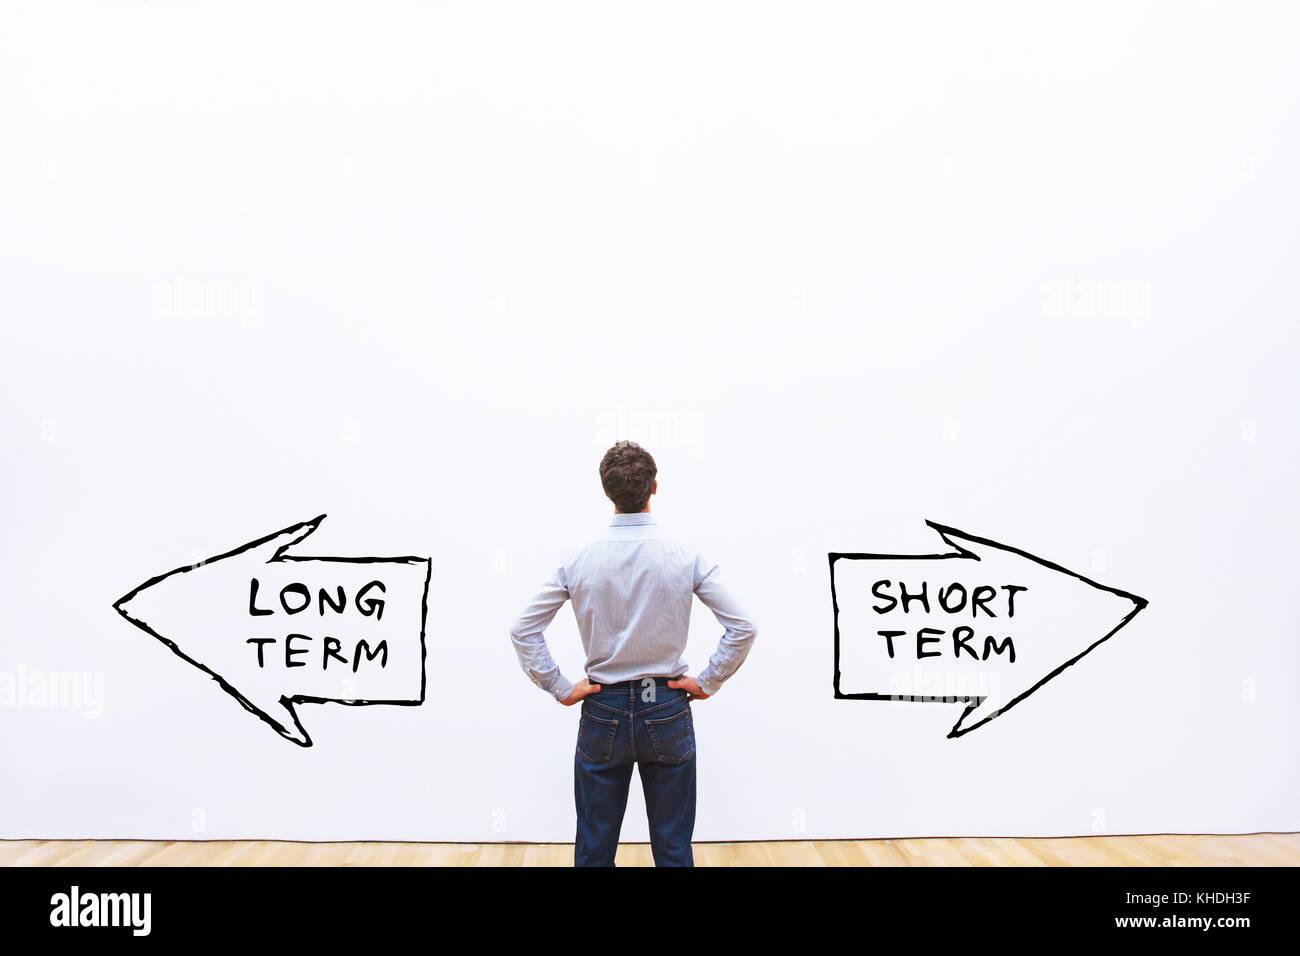 long term vs short term concept - Stock Image